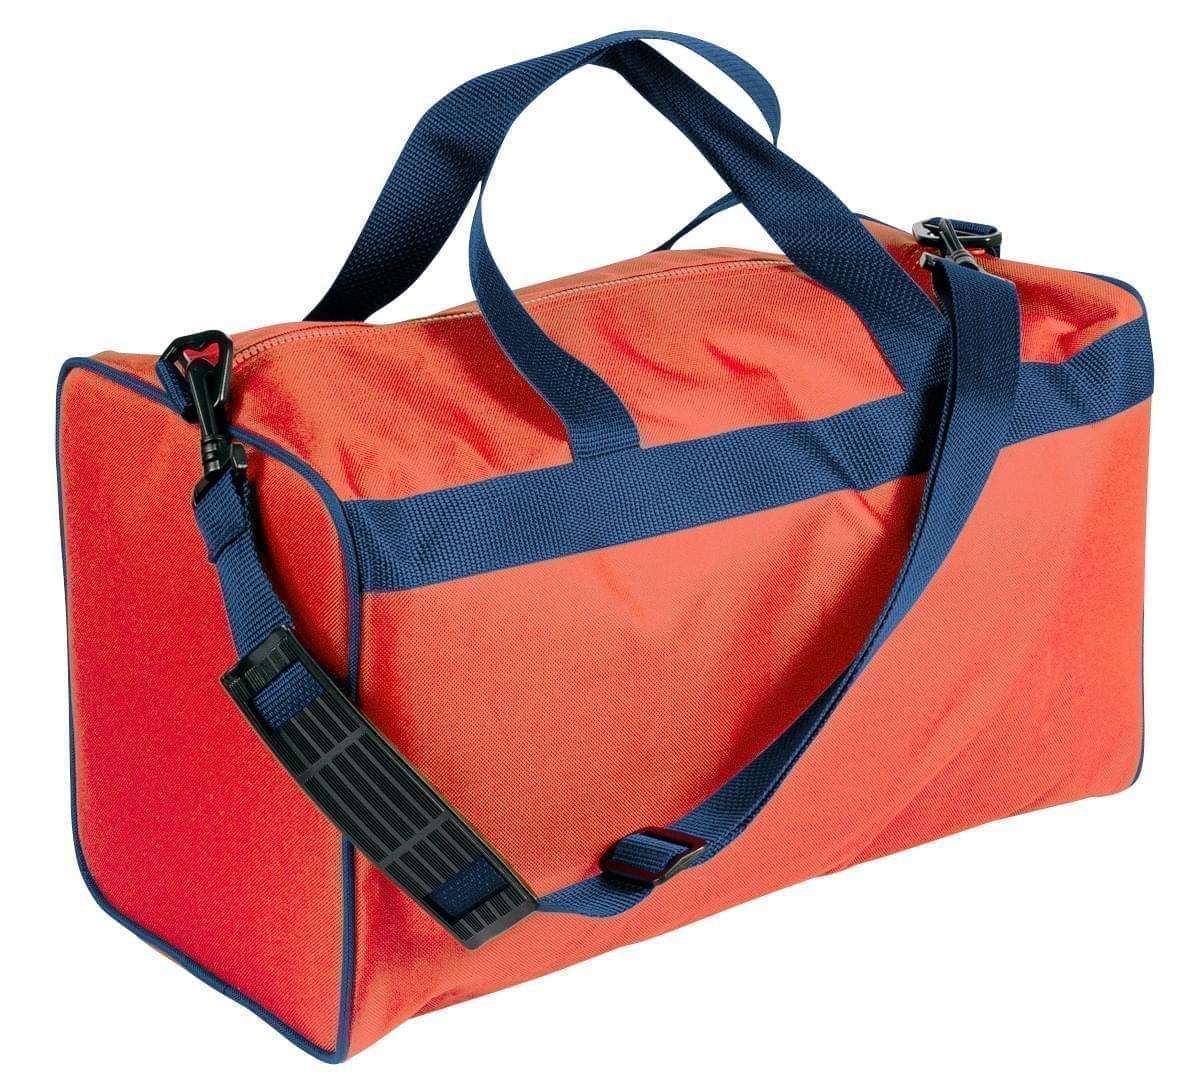 USA Made Nylon Poly Weekend Duffles, Orange-Navy, WLKX31AAXZ